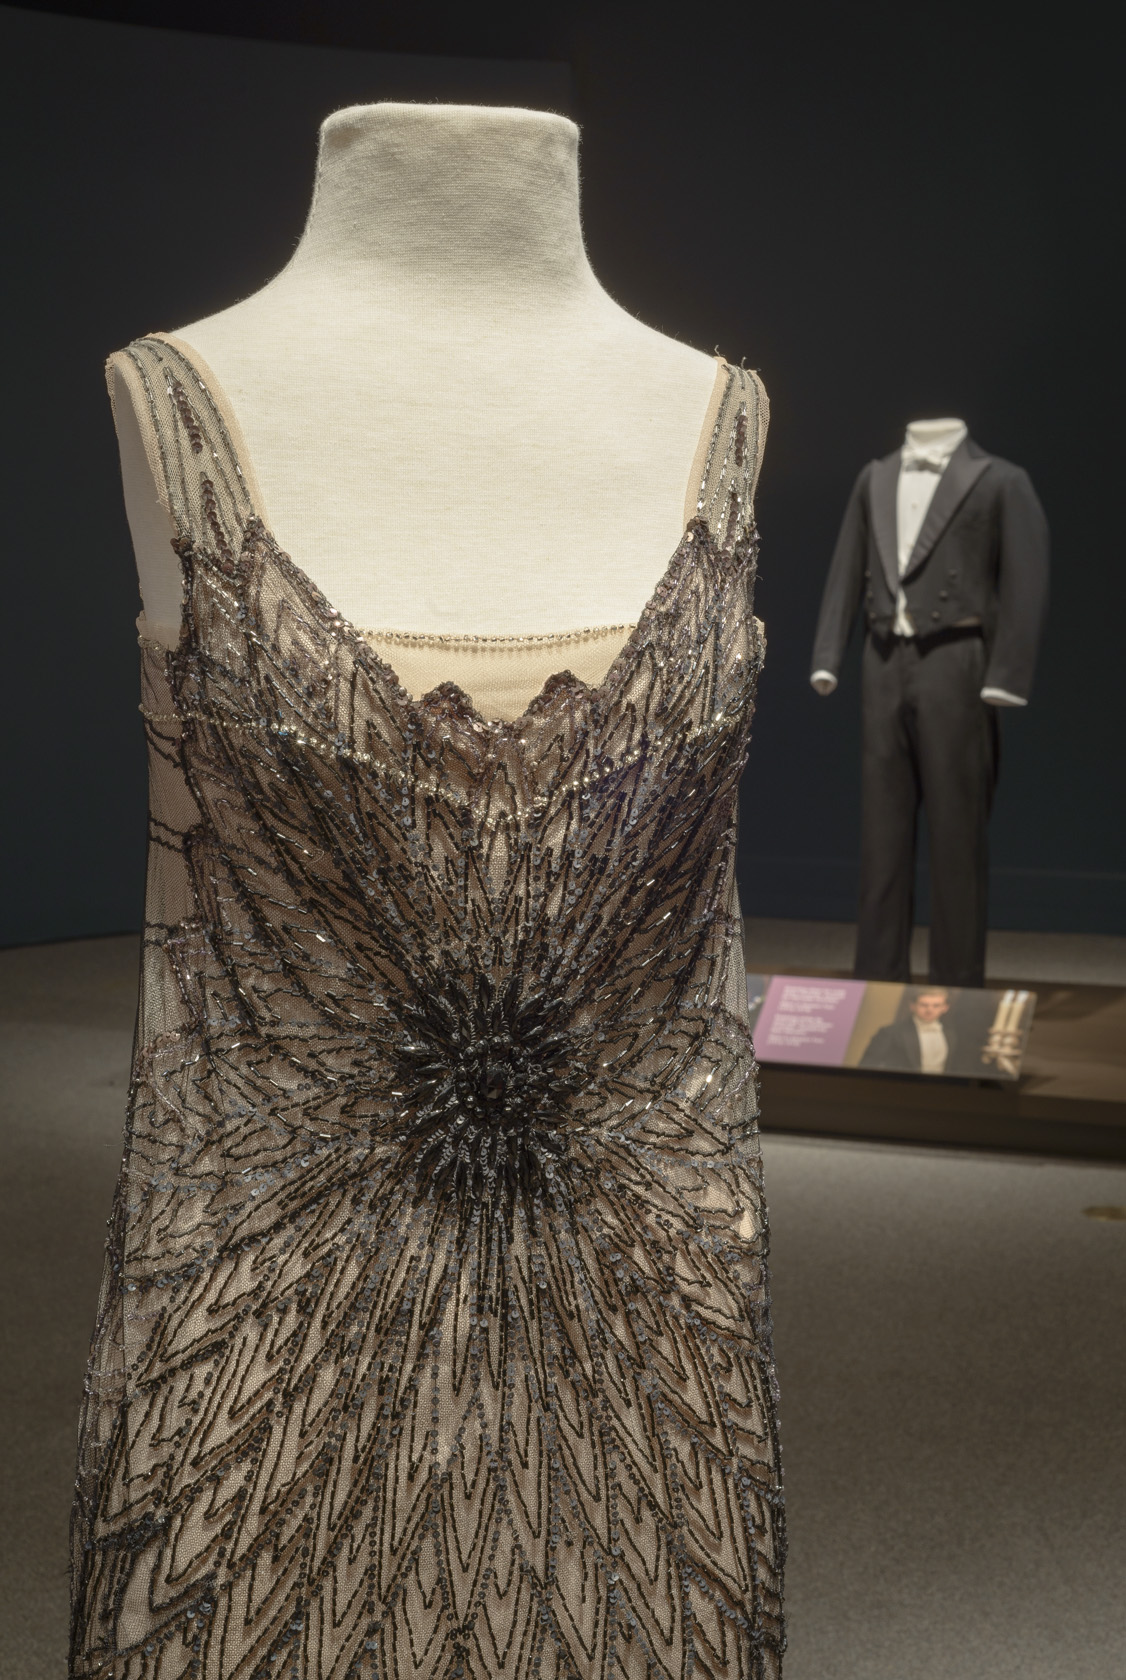 Mary's evening dress